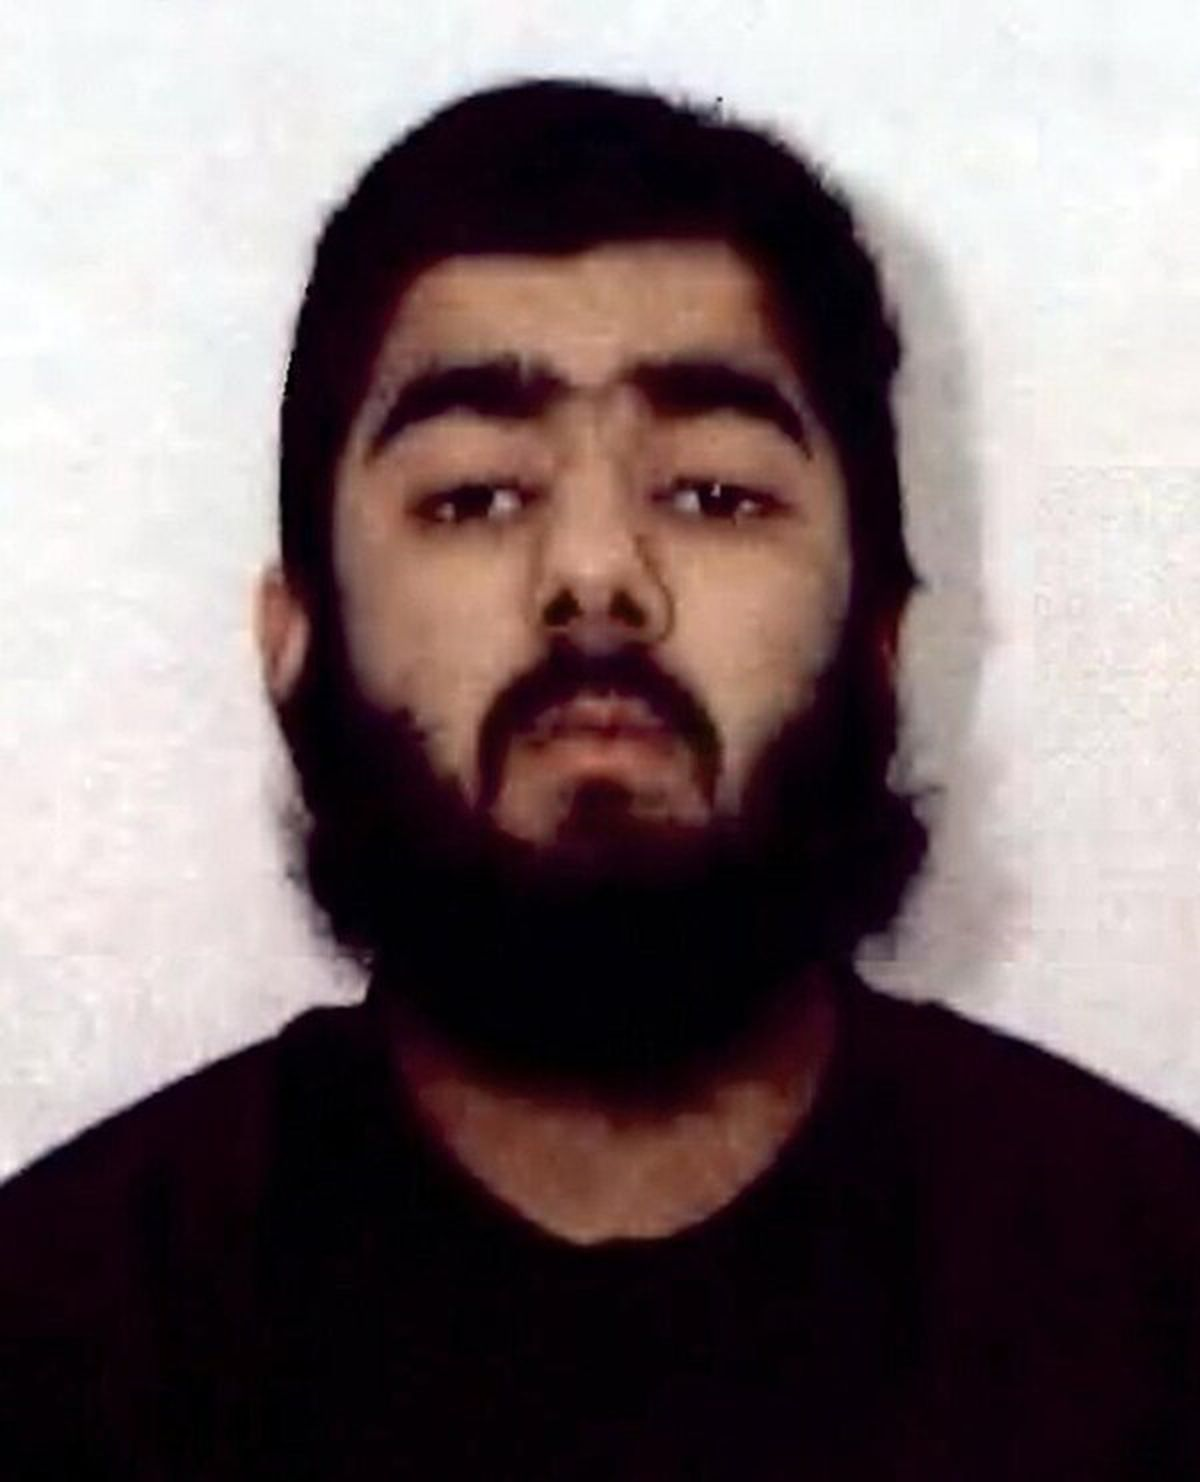 Usman Khan killed two people in November's attack at London Bridge